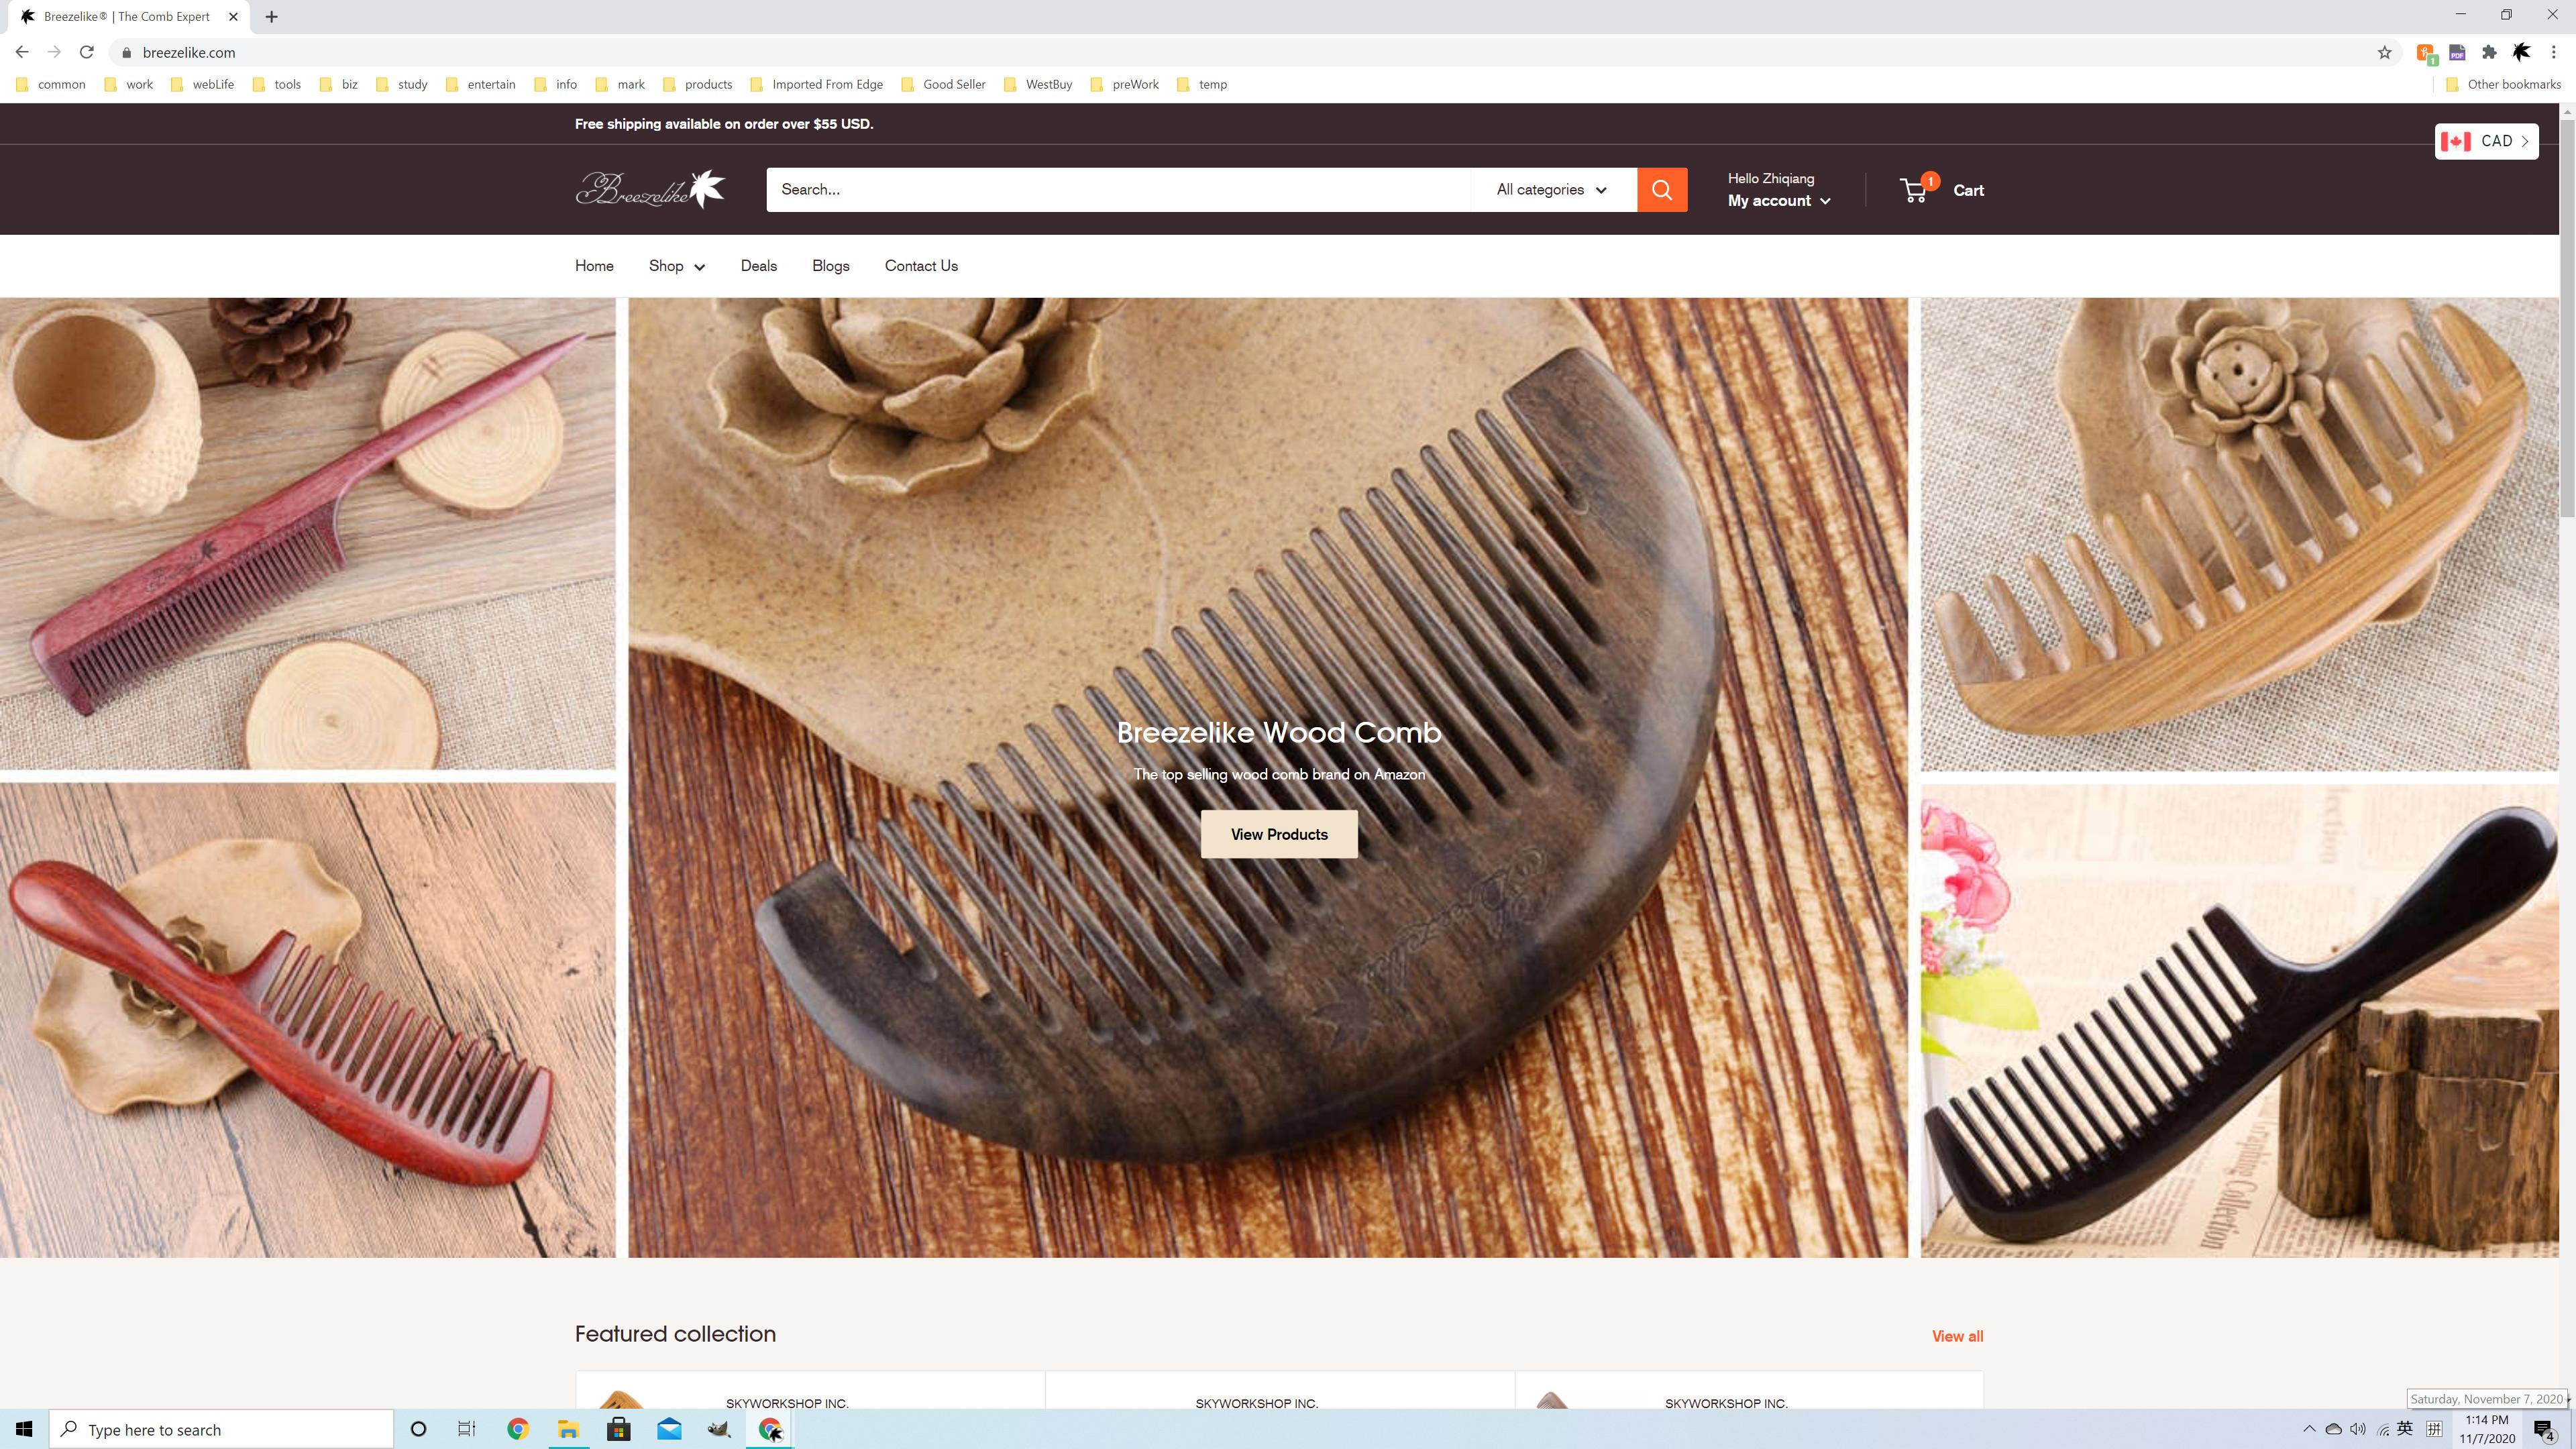 Breezelike | The Comb Expert screenshot